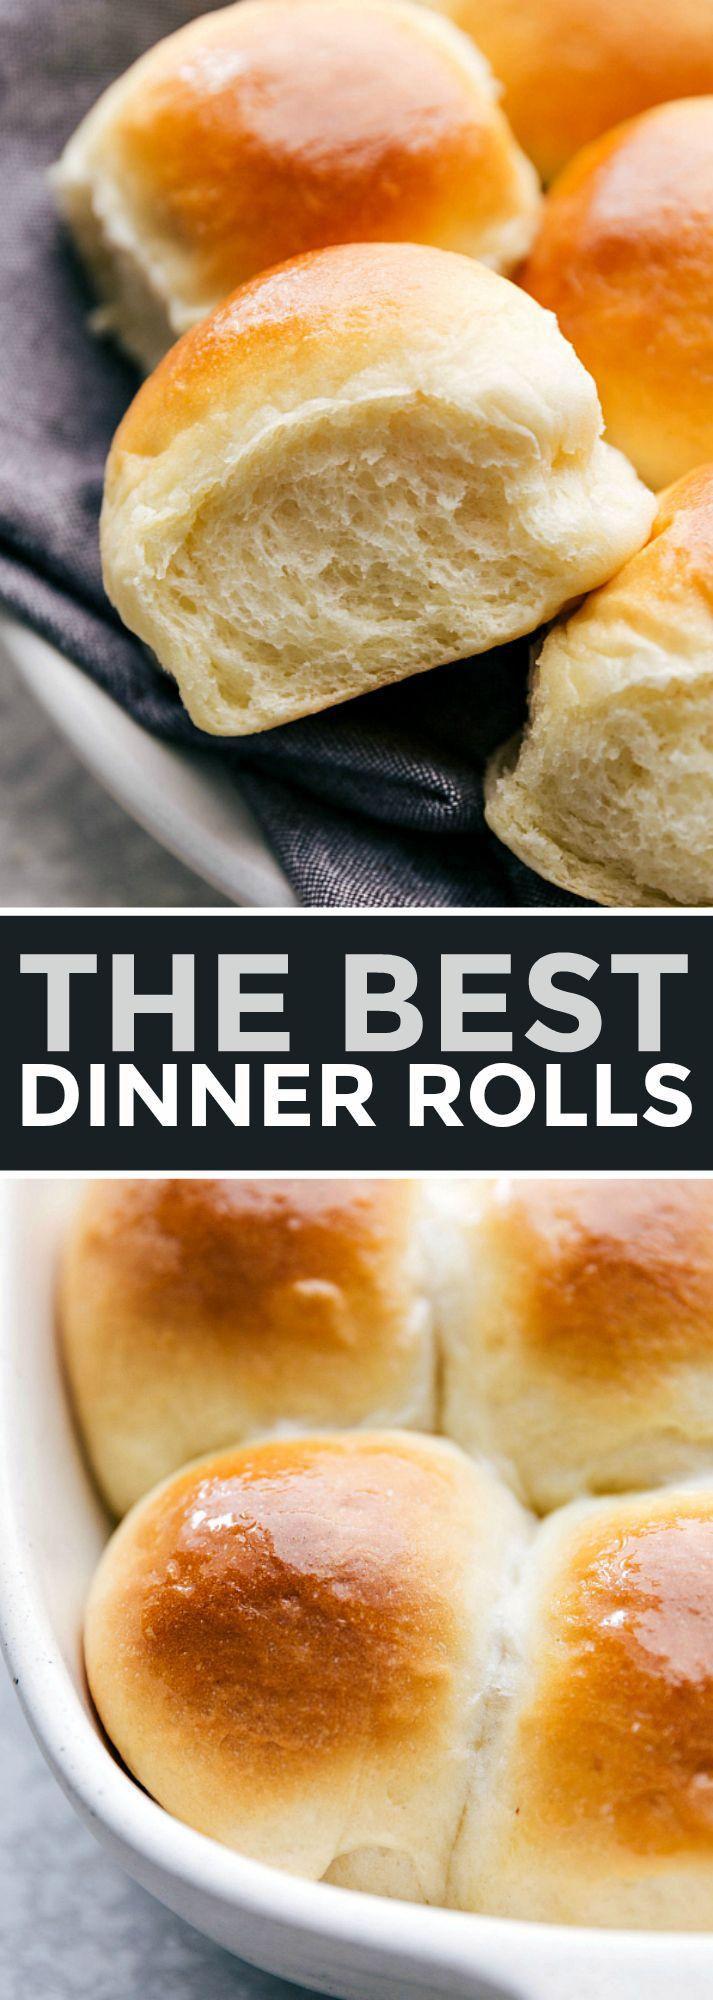 Dinner Rolls images